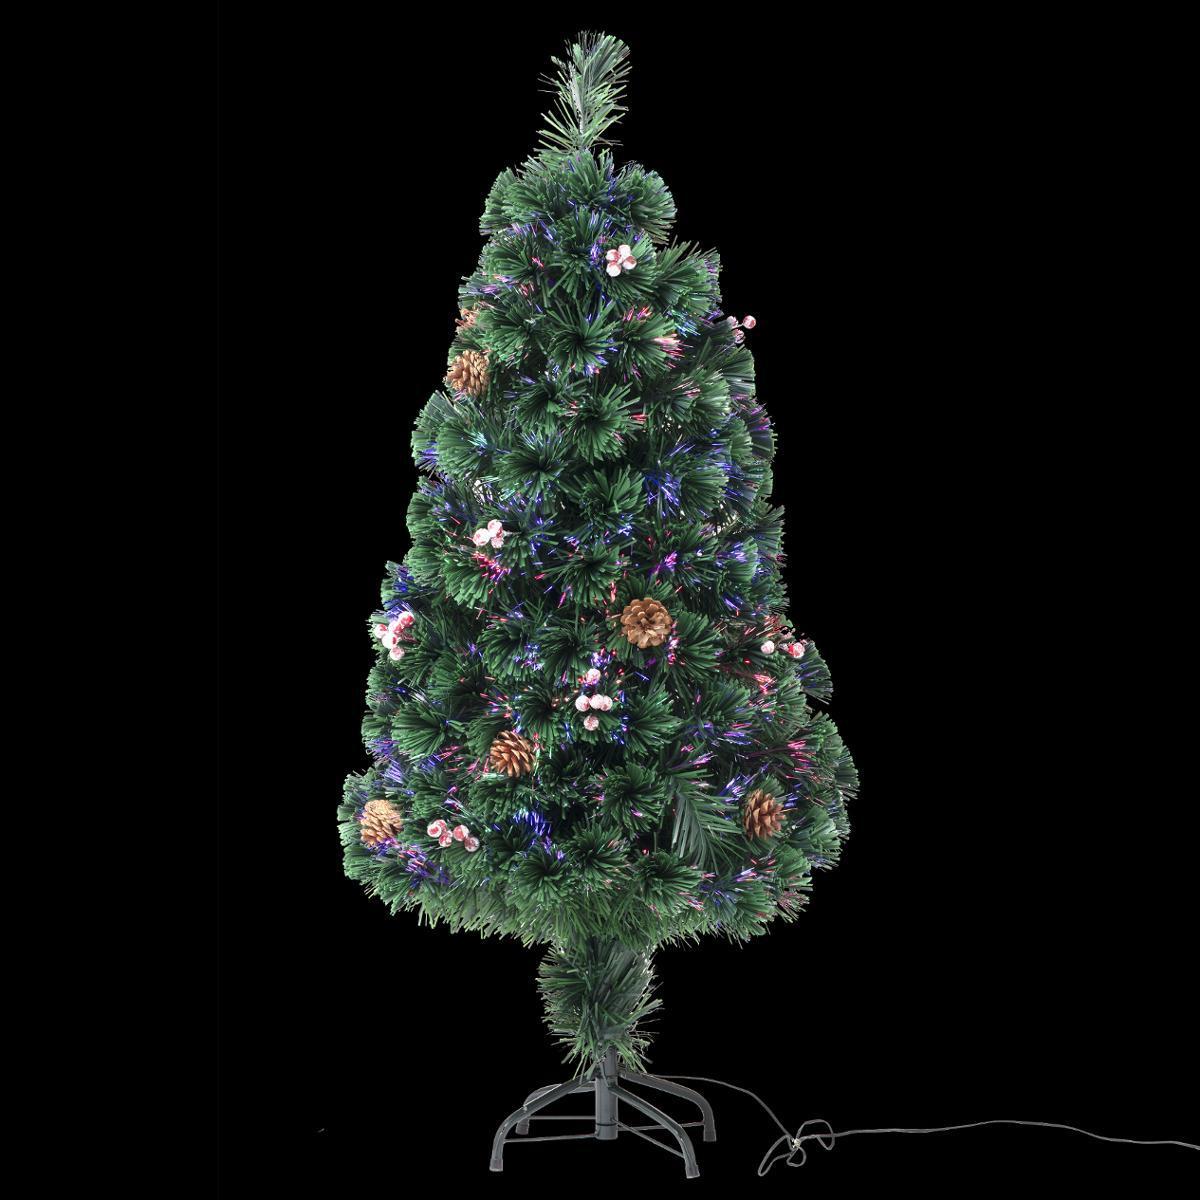 Feeric Christmas Sapin de Noël artificiel fibre optique Vienna 120 cm - Fééric Christmas